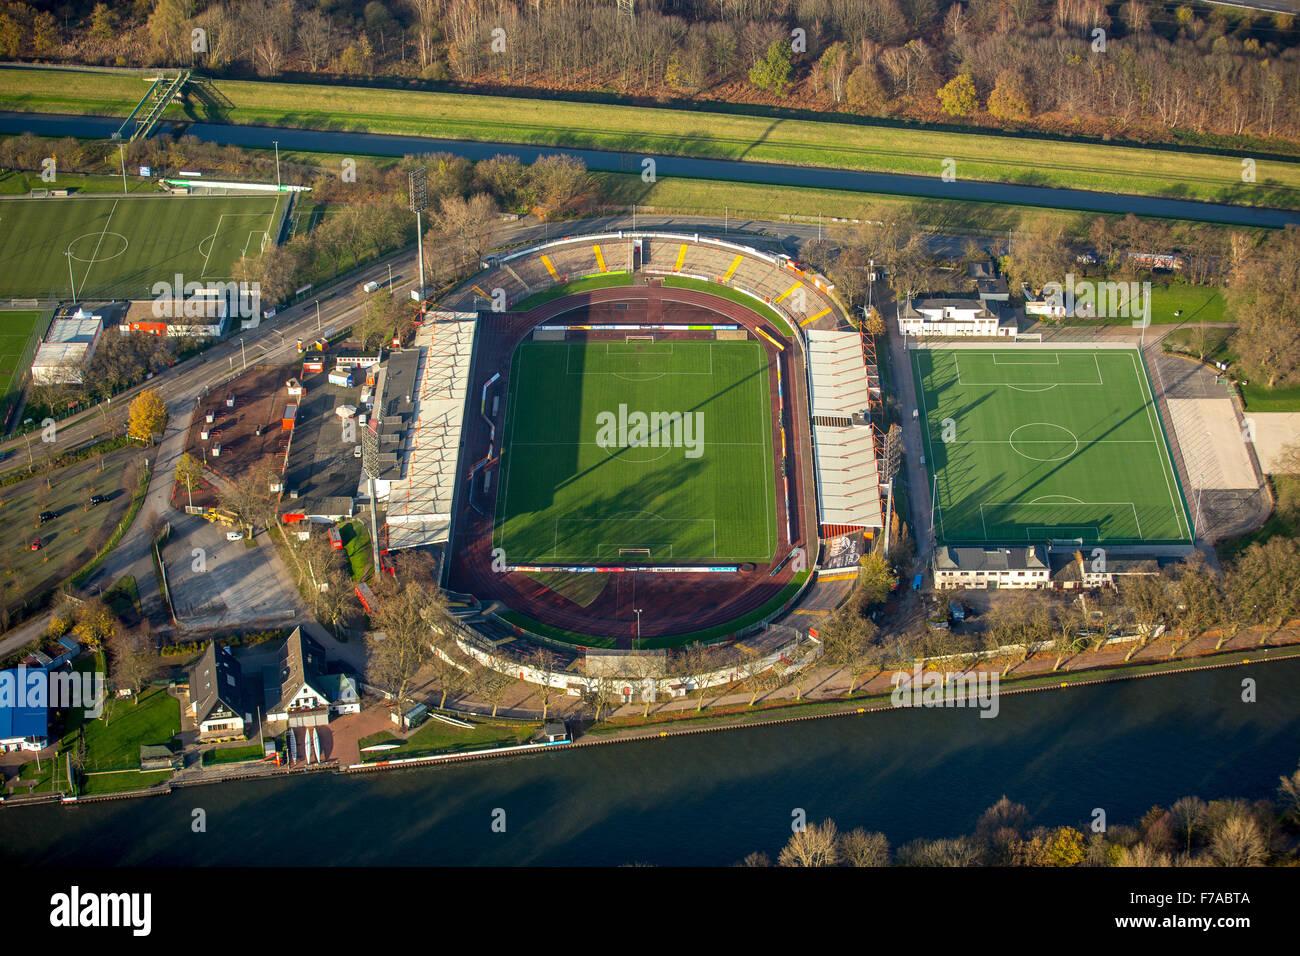 RWO Stadium, Niederrheinstadion Oberhausen between Emscher and Rhine-Herne Canal, Oberhausen, Ruhr, North Rhine - Stock Image